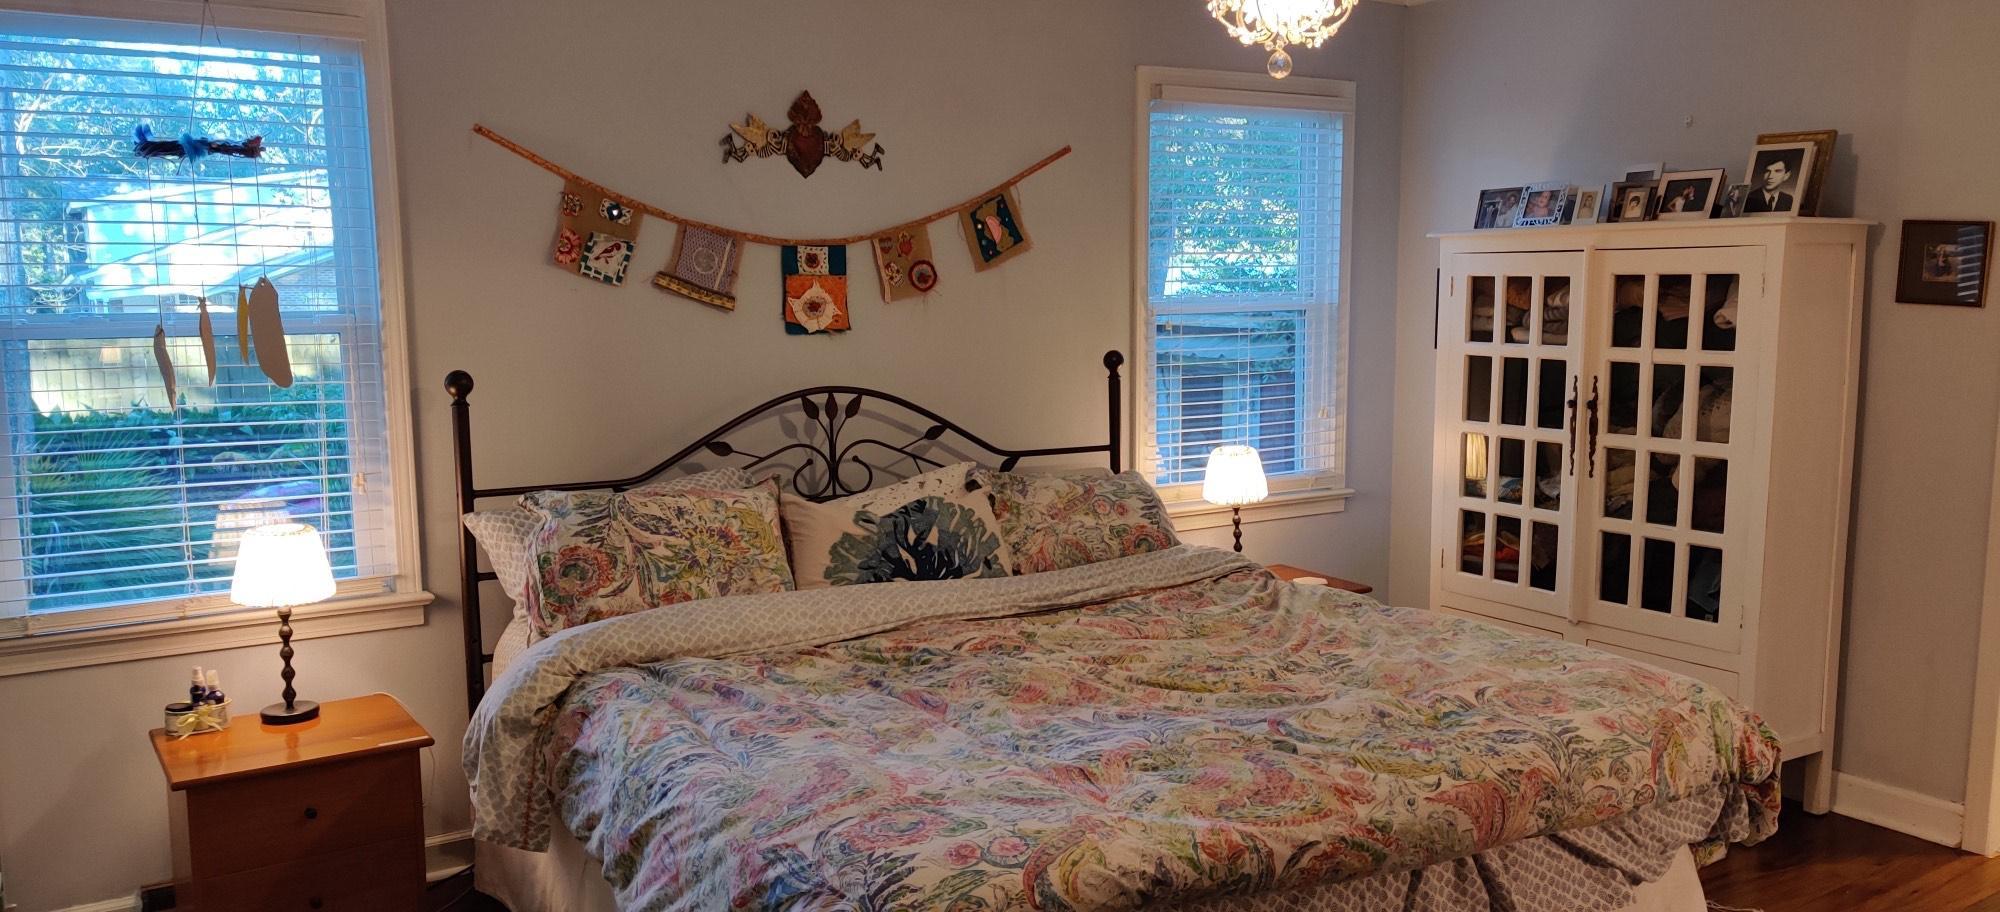 Shemwood II Homes For Sale - 950 Sea Gull, Mount Pleasant, SC - 16